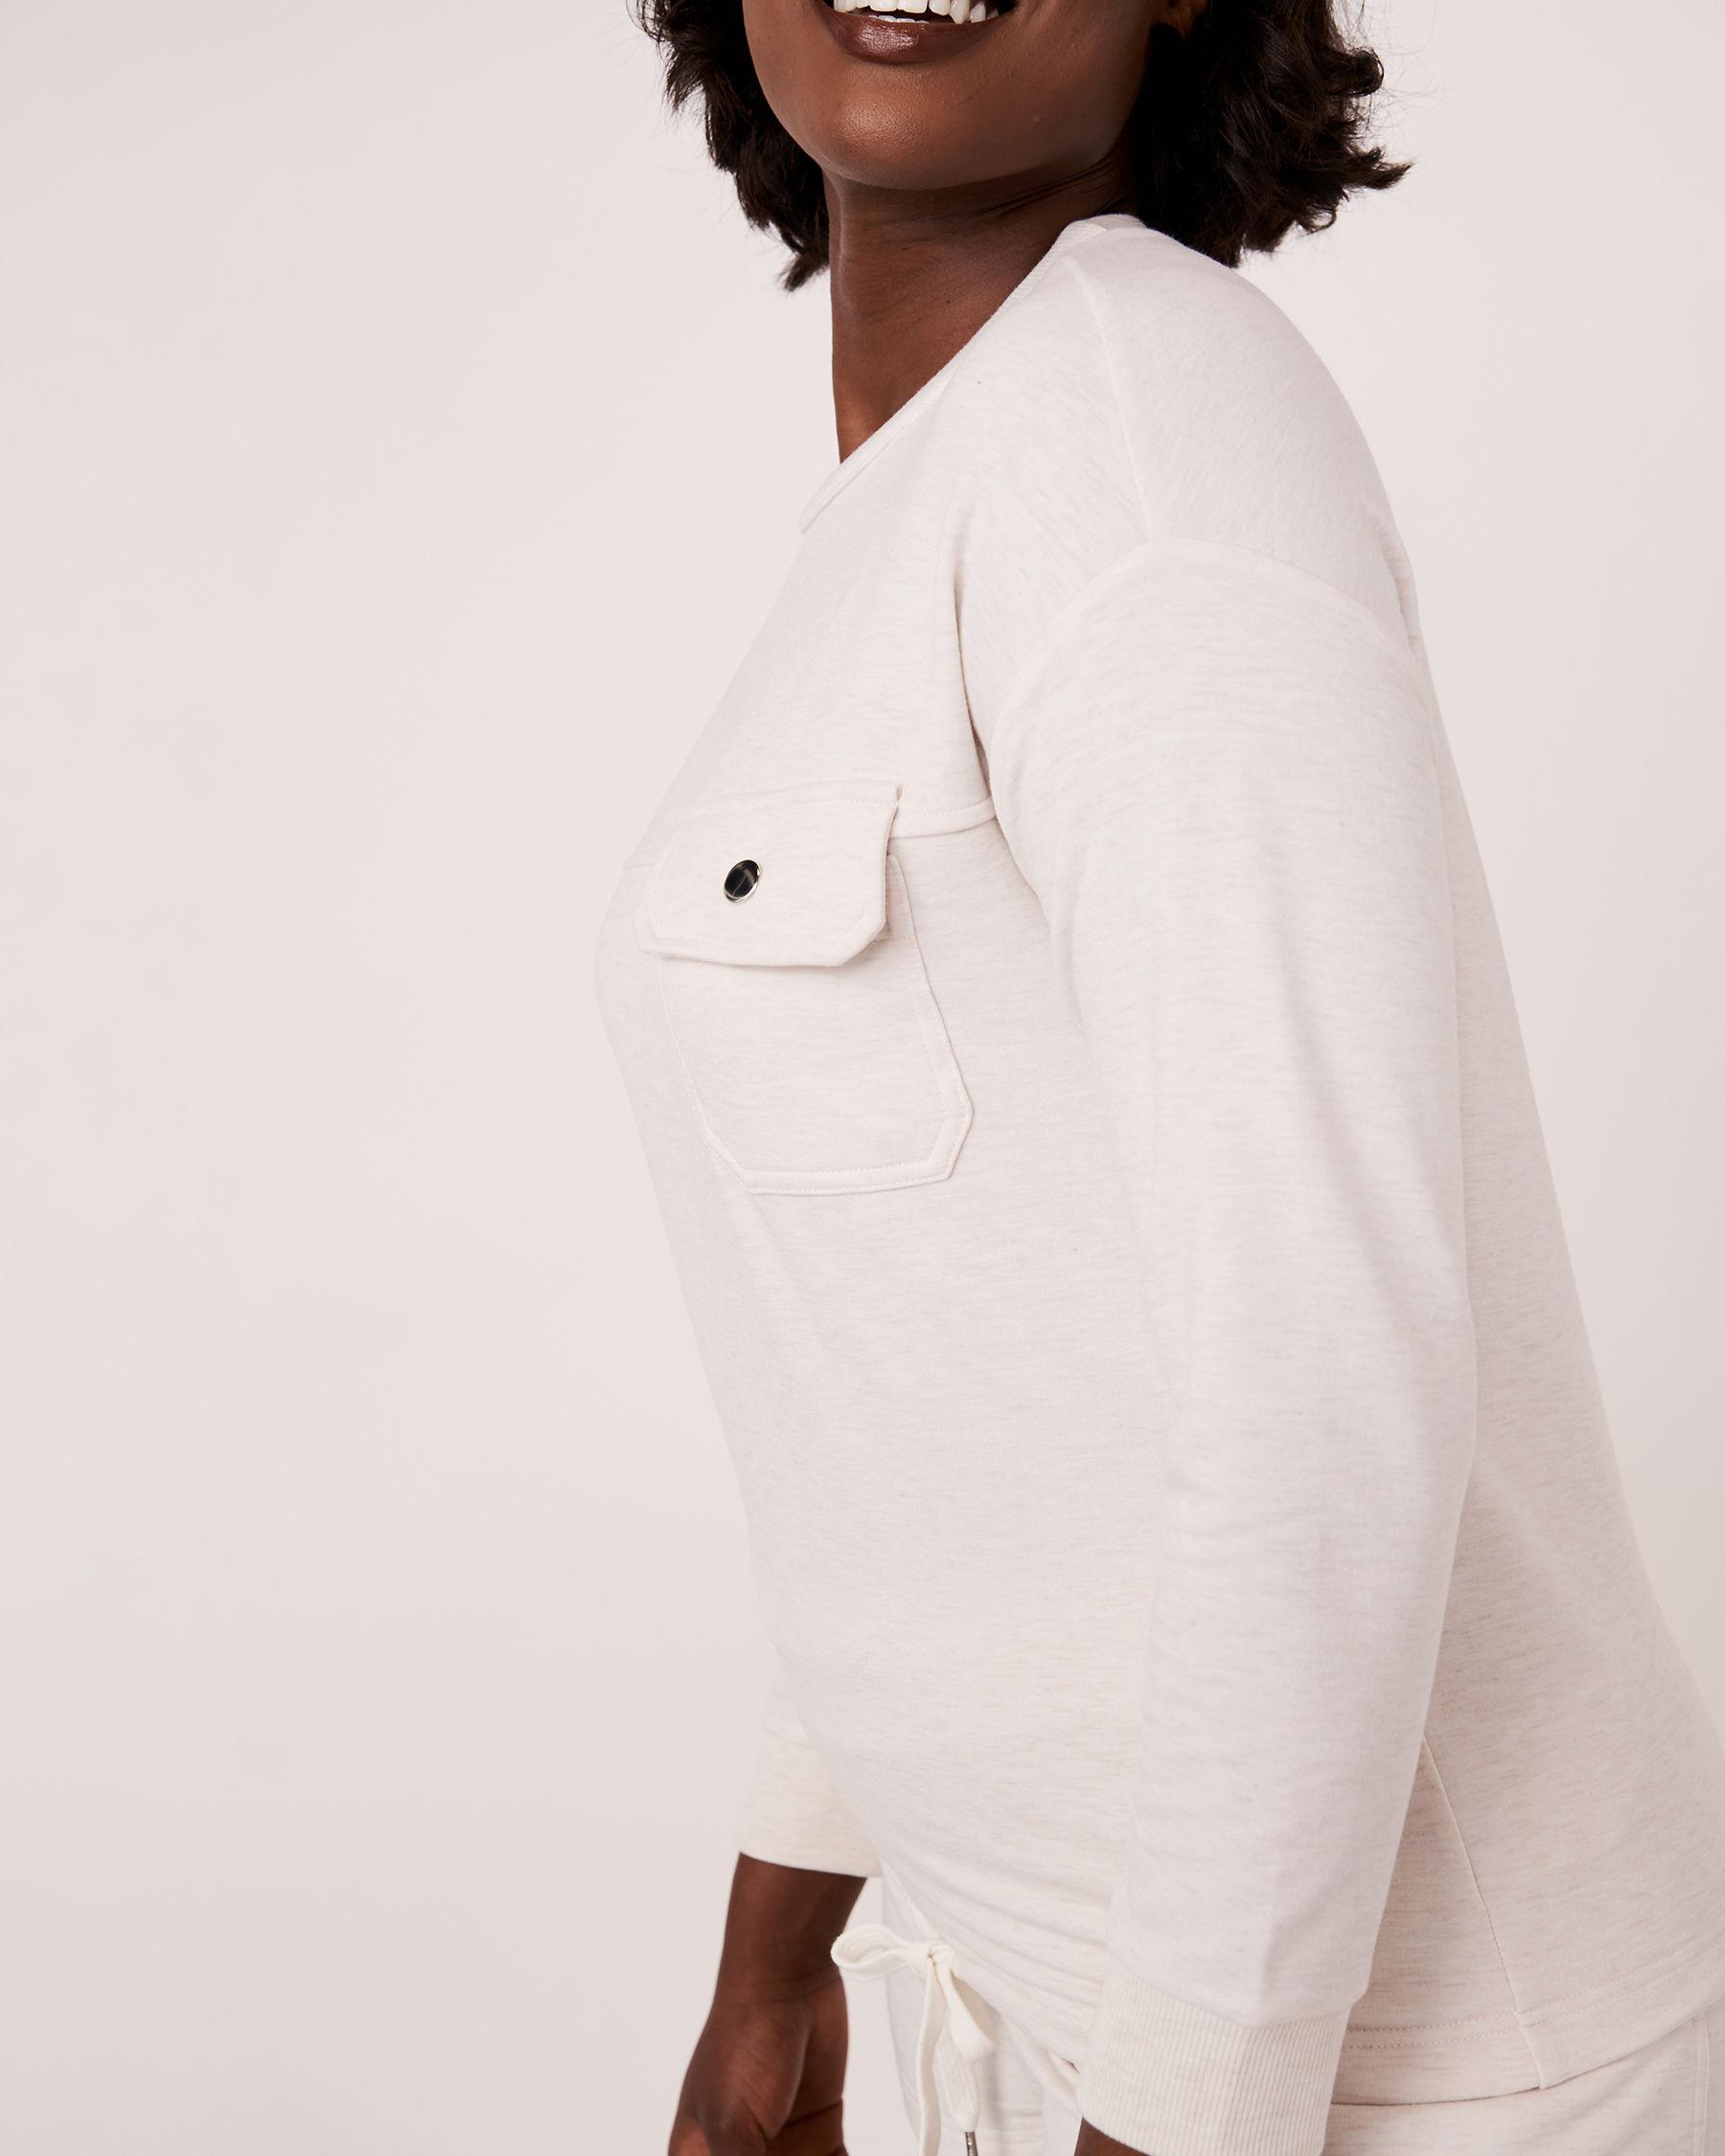 LA VIE EN ROSE Patch Pocket Long Sleeve Shirt Soft grey 50100004 - View3